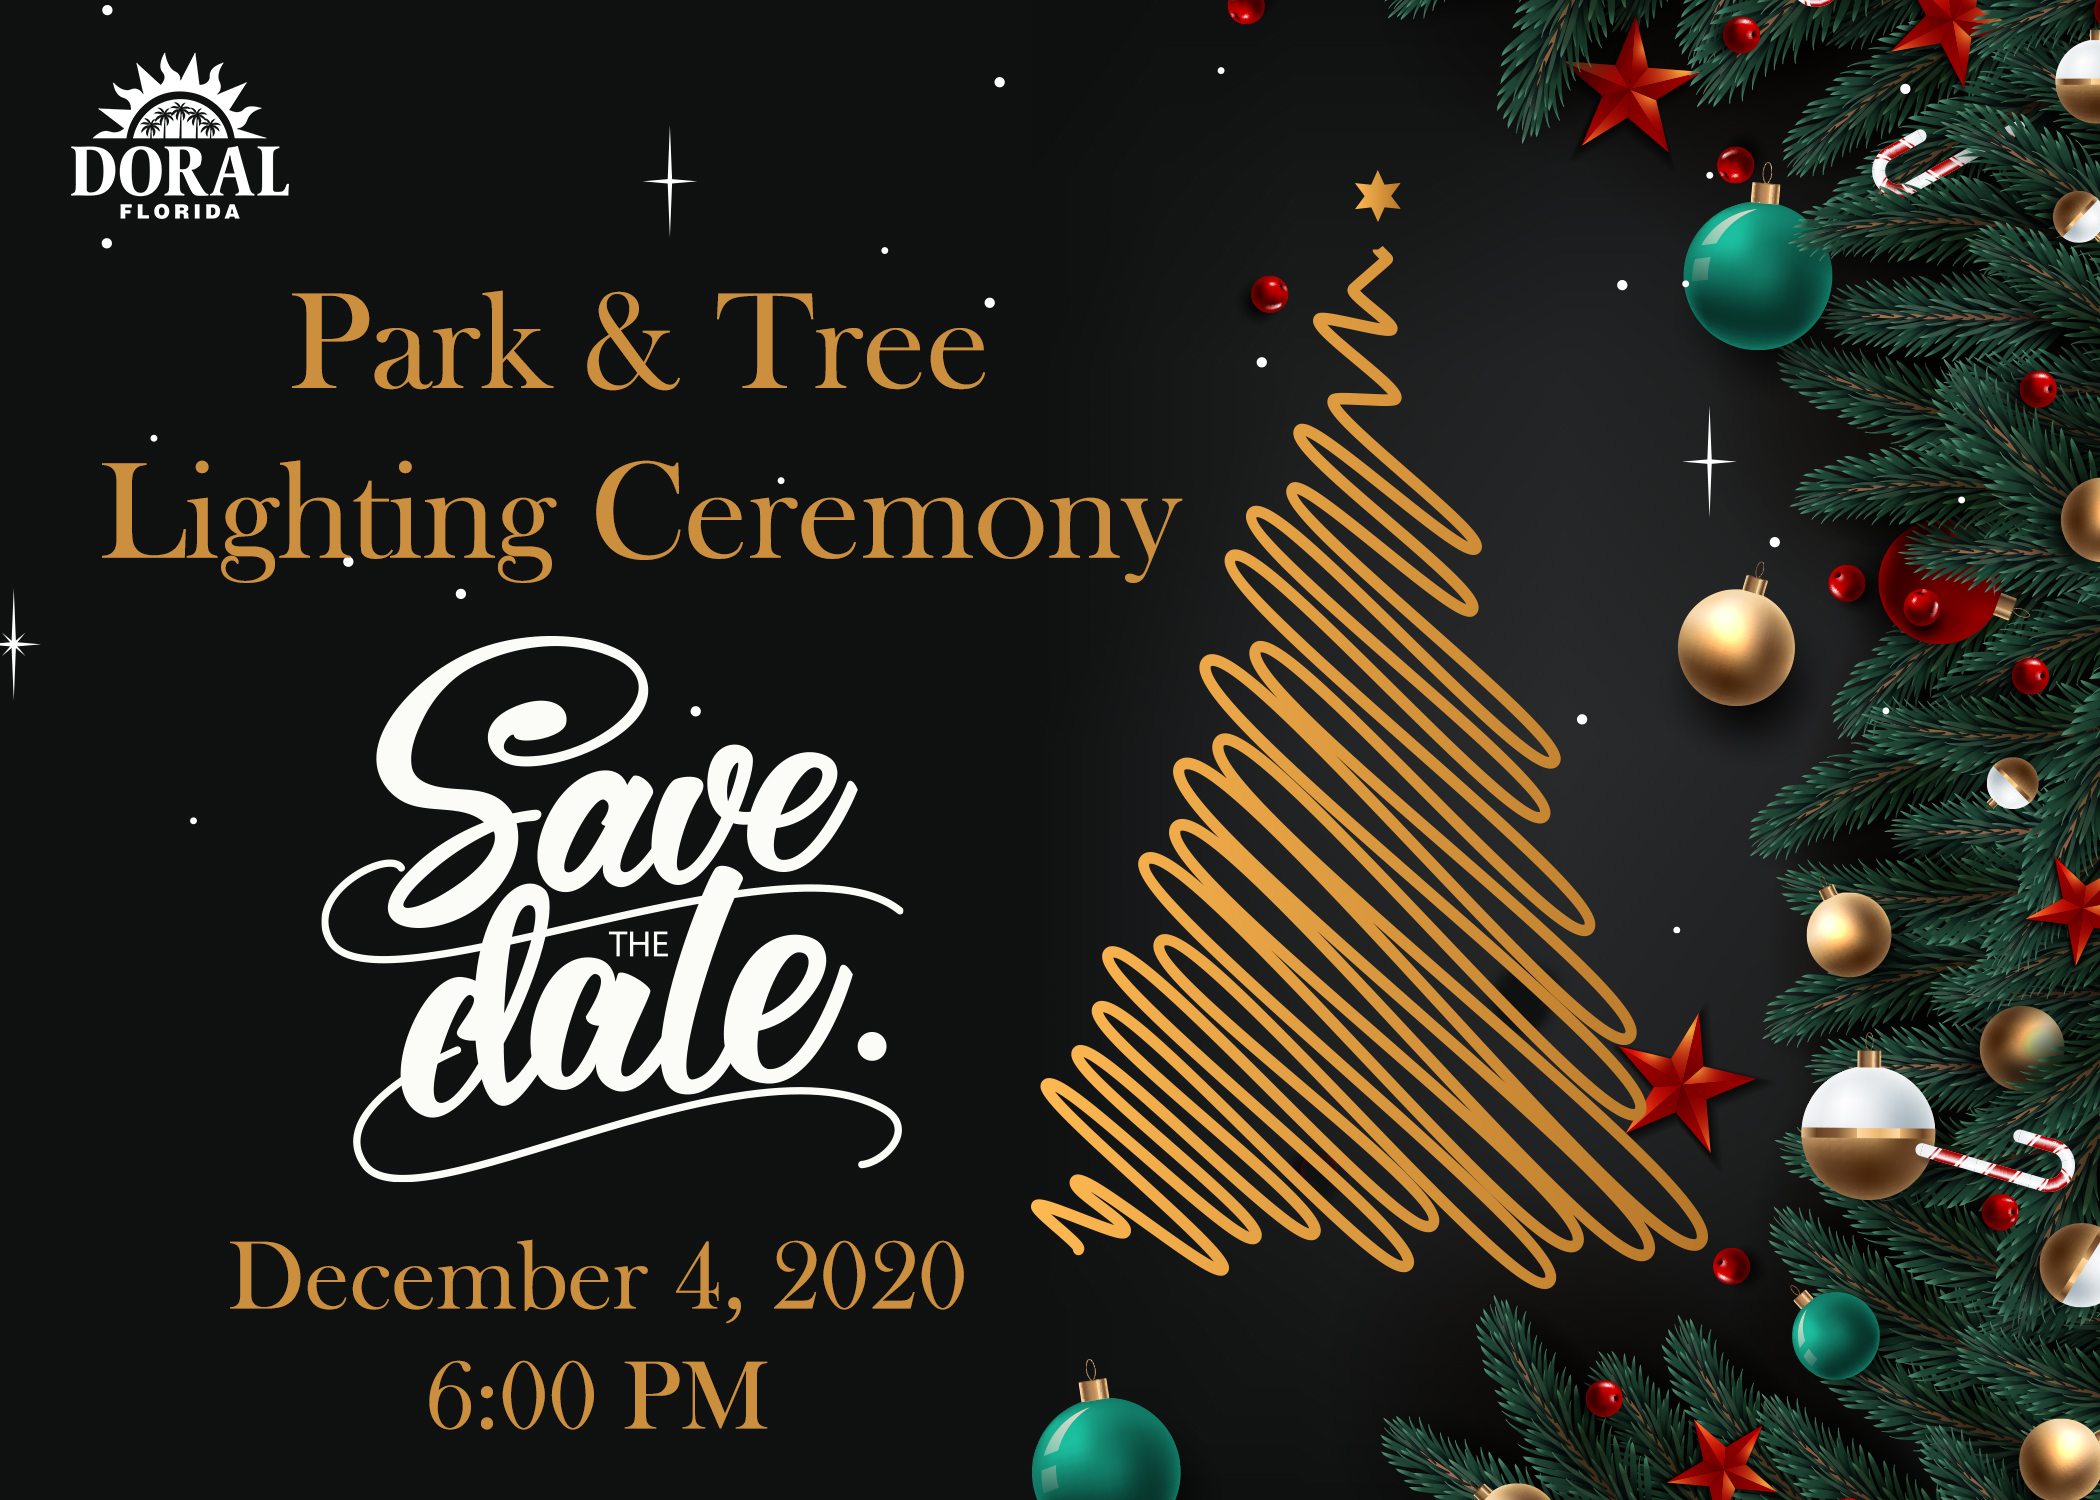 Park and Tree Lighting Ceremony